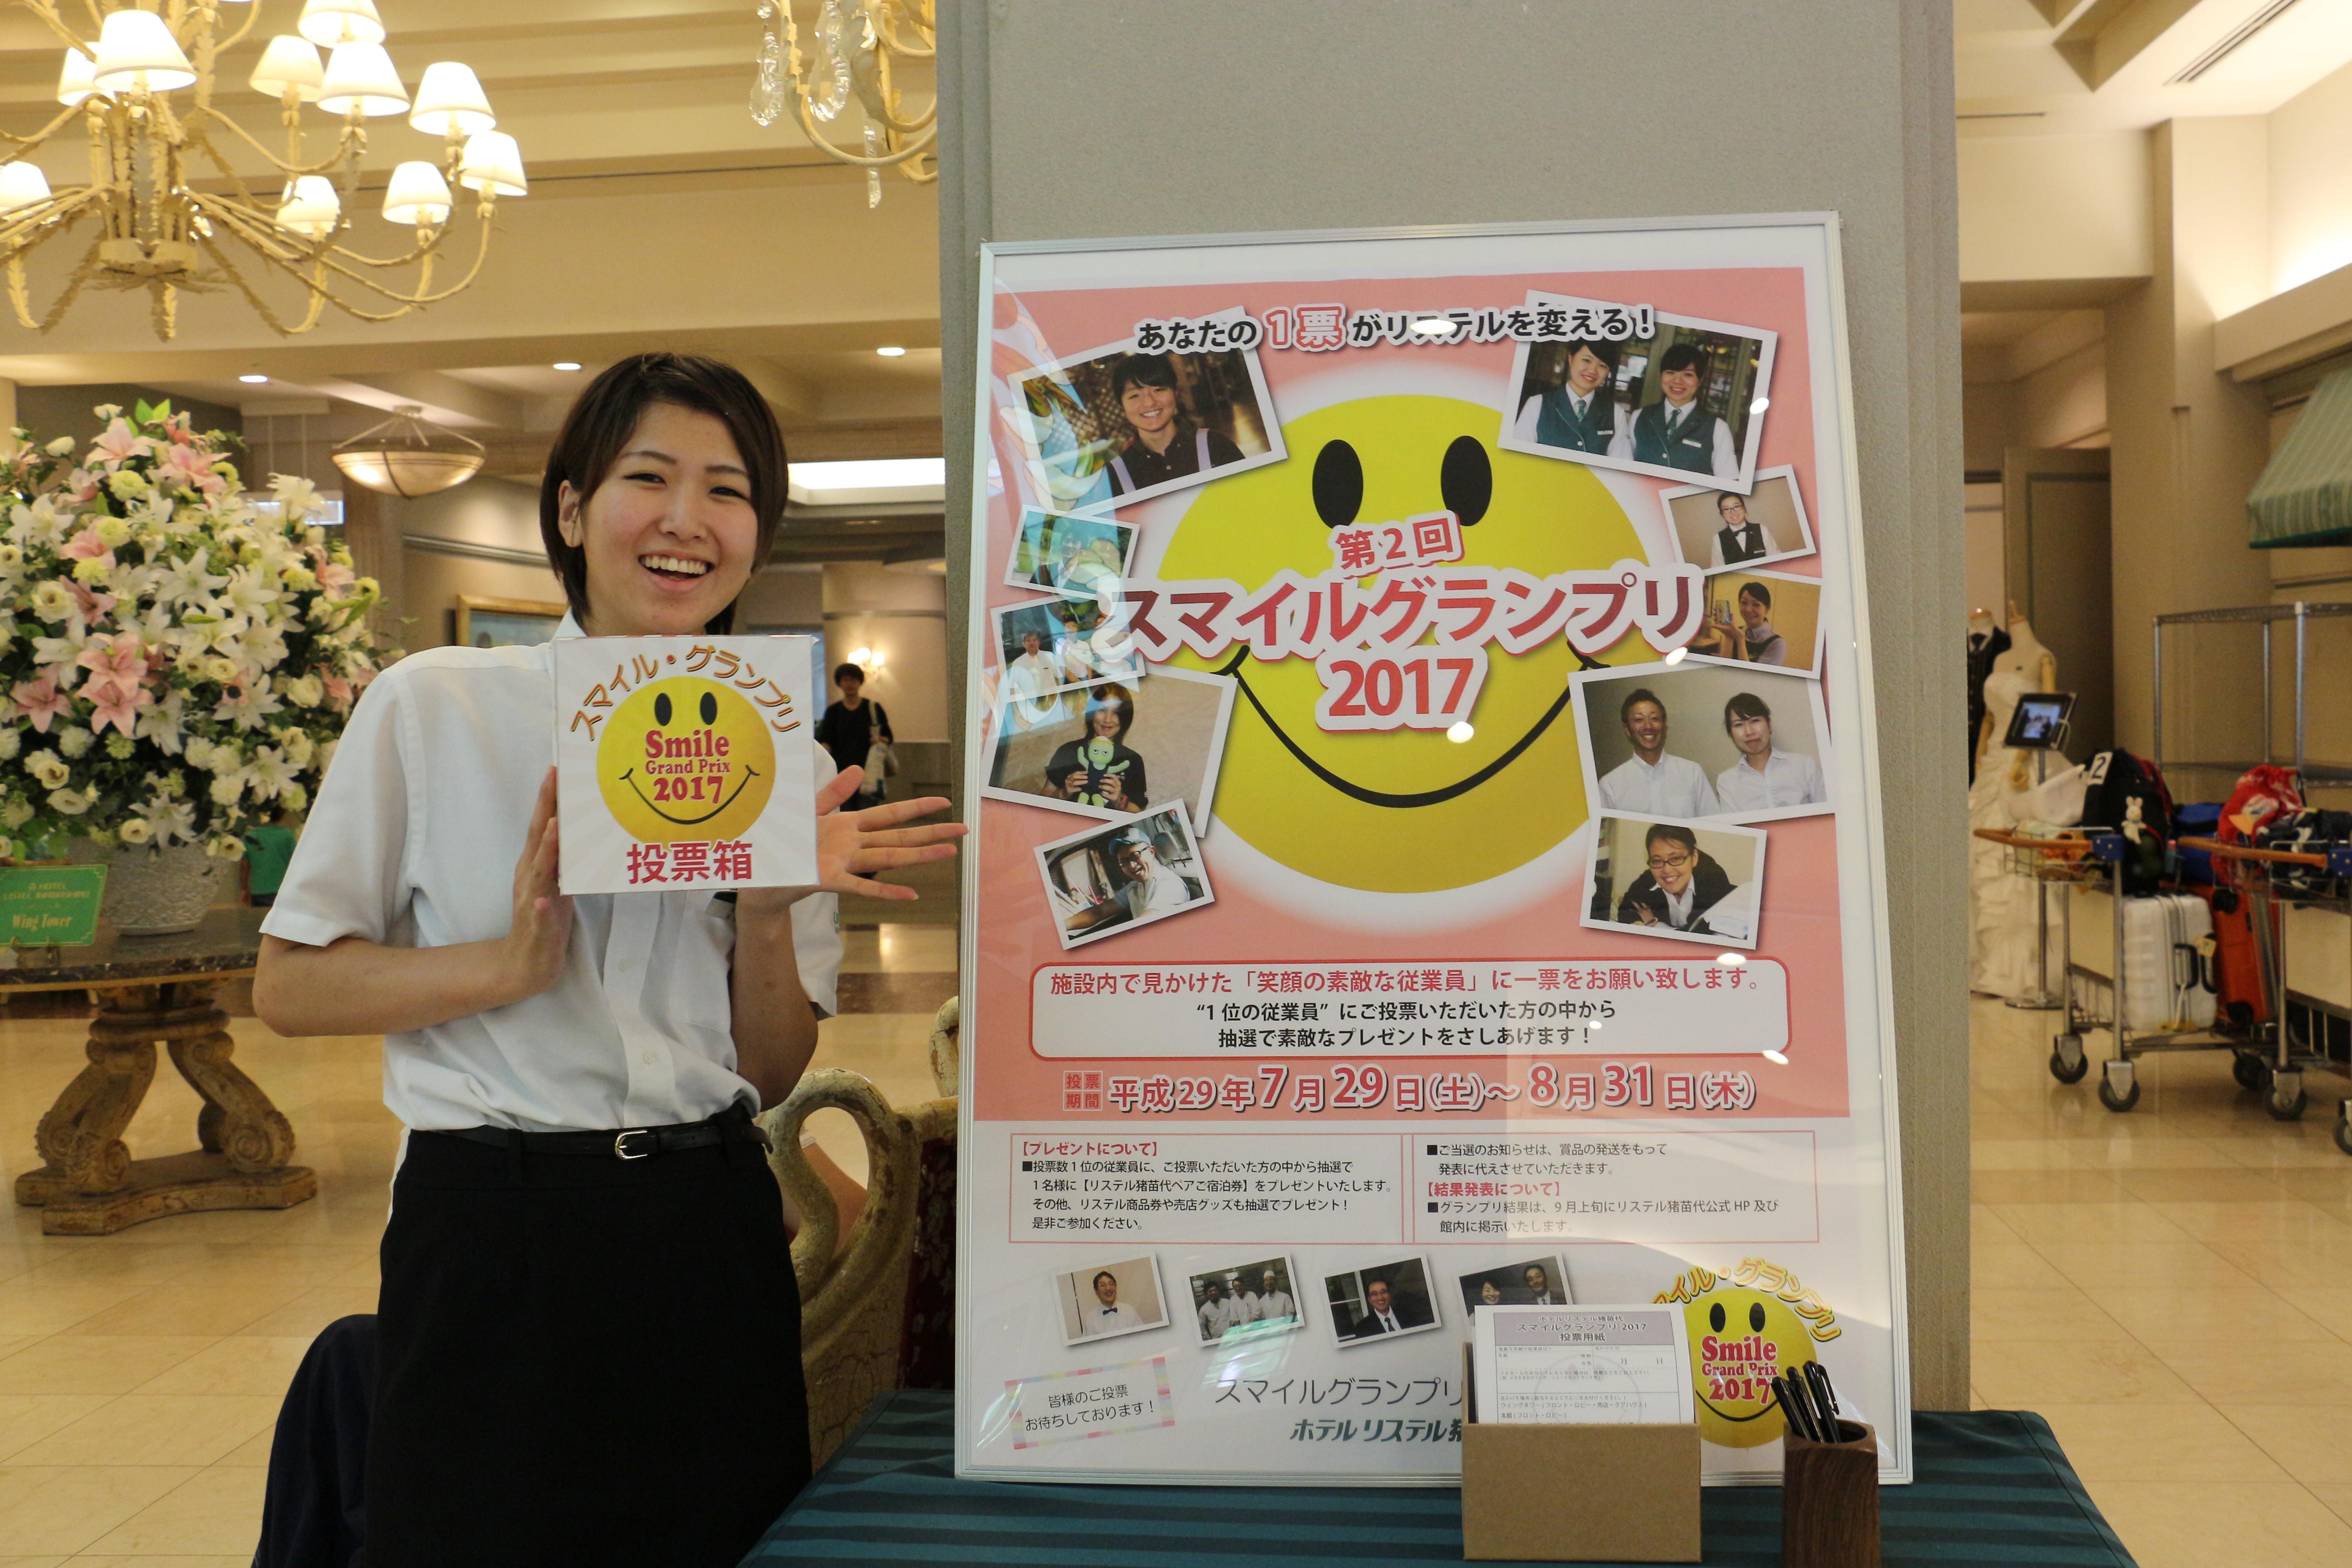 http://www.listel-inawashiro.jp/blog/2017/08/02/IMG_6234.JPG